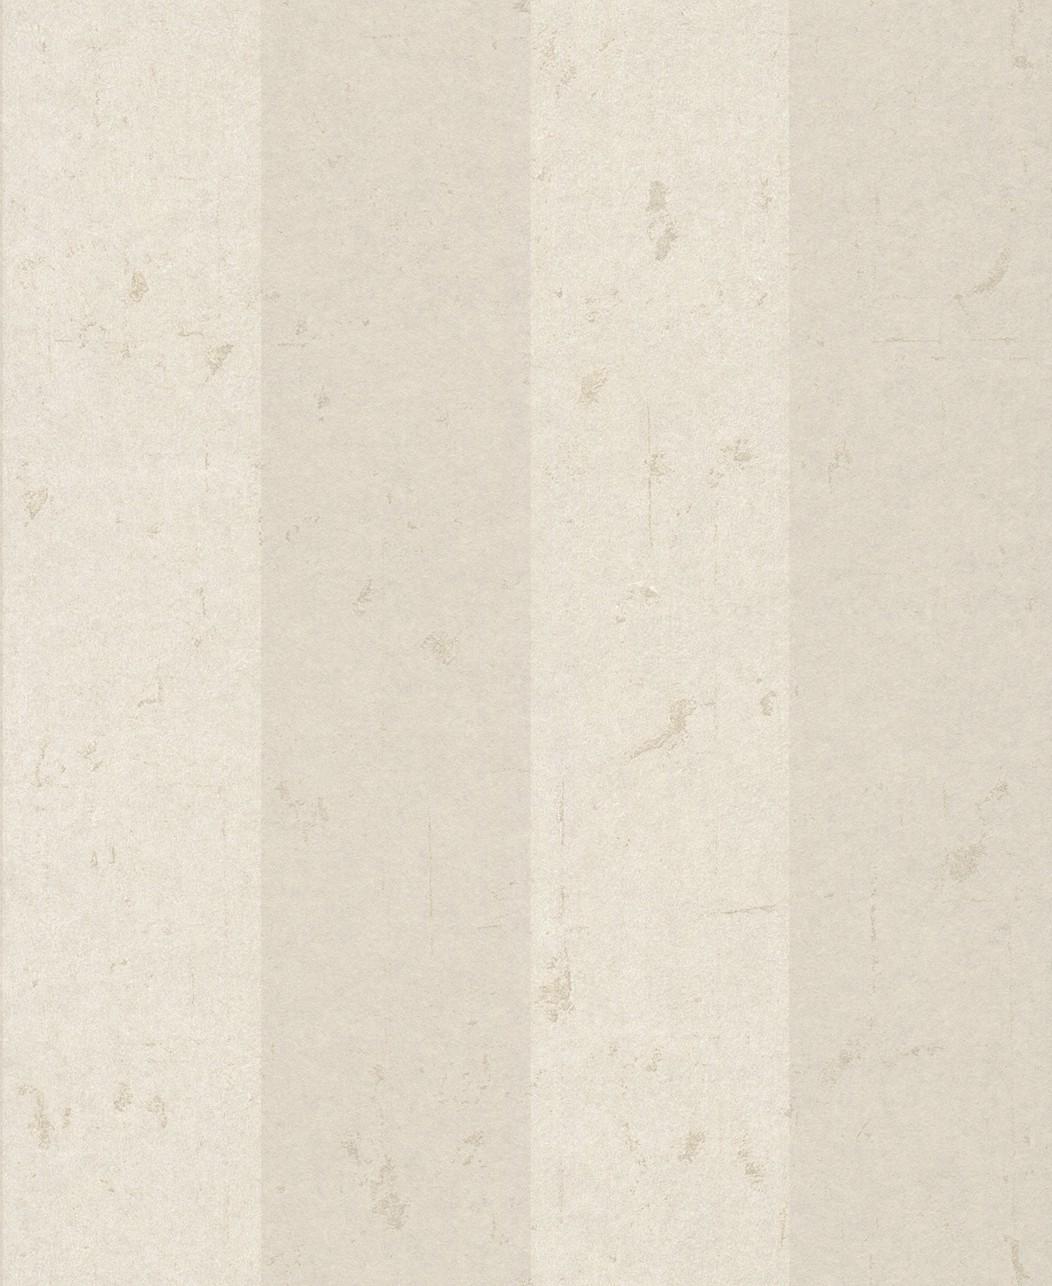 rasch textil tapete tintura gestreift beige 227375. Black Bedroom Furniture Sets. Home Design Ideas